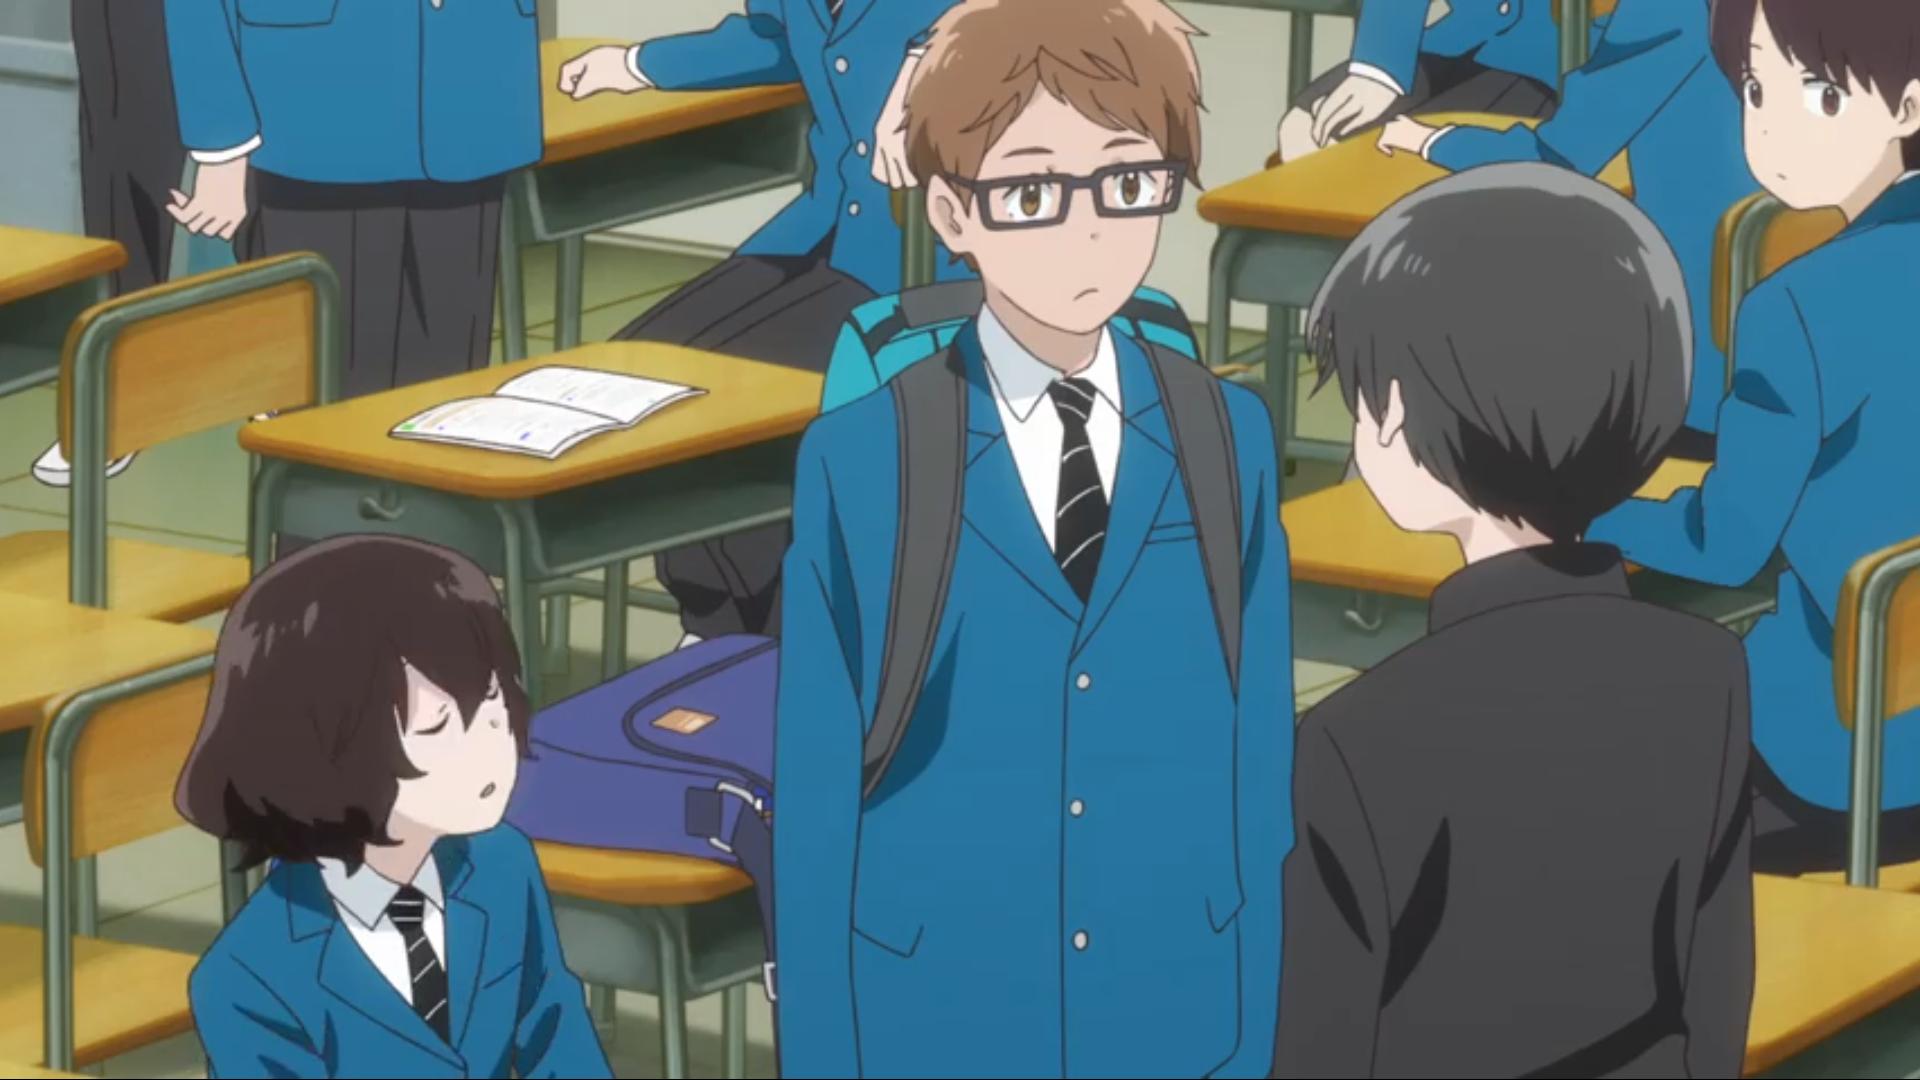 Stars Align, Hoshiai no Sora Sora, Anime, Japanese animation